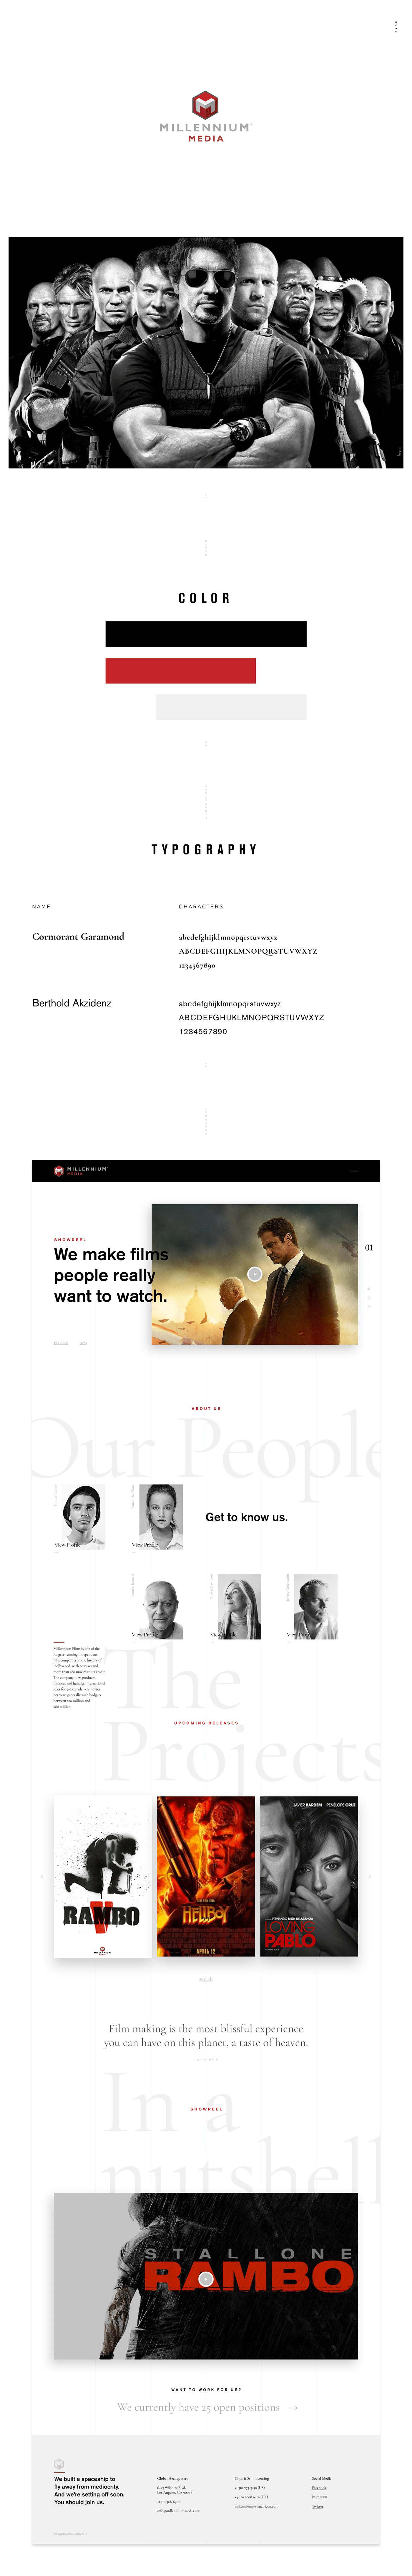 art direction  Art Director branding  Corporate Design Entertainment Film   Movies UI ux Web Design